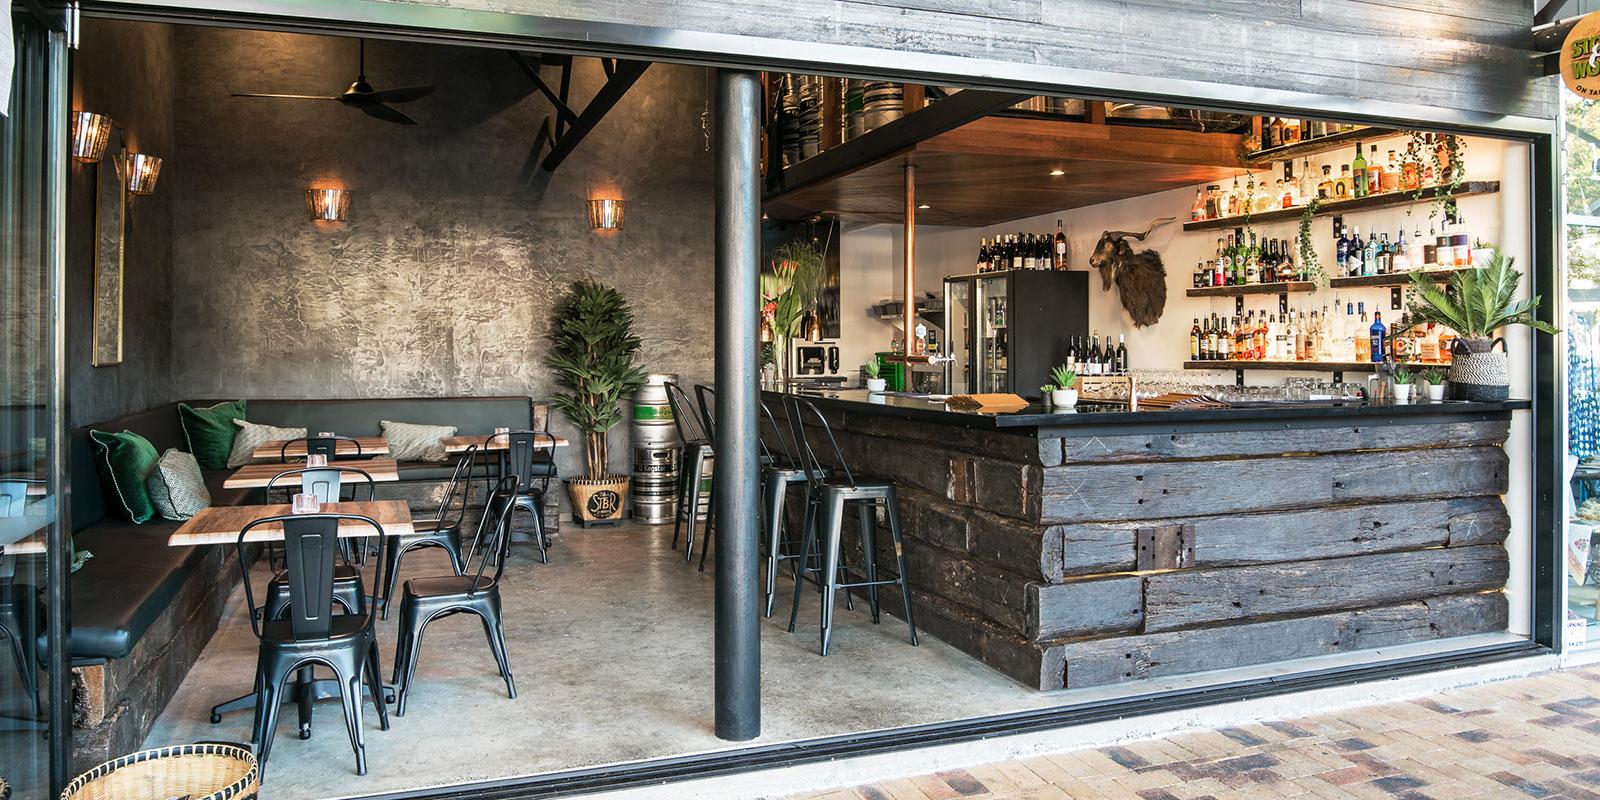 Eddie Cheeba's Bar